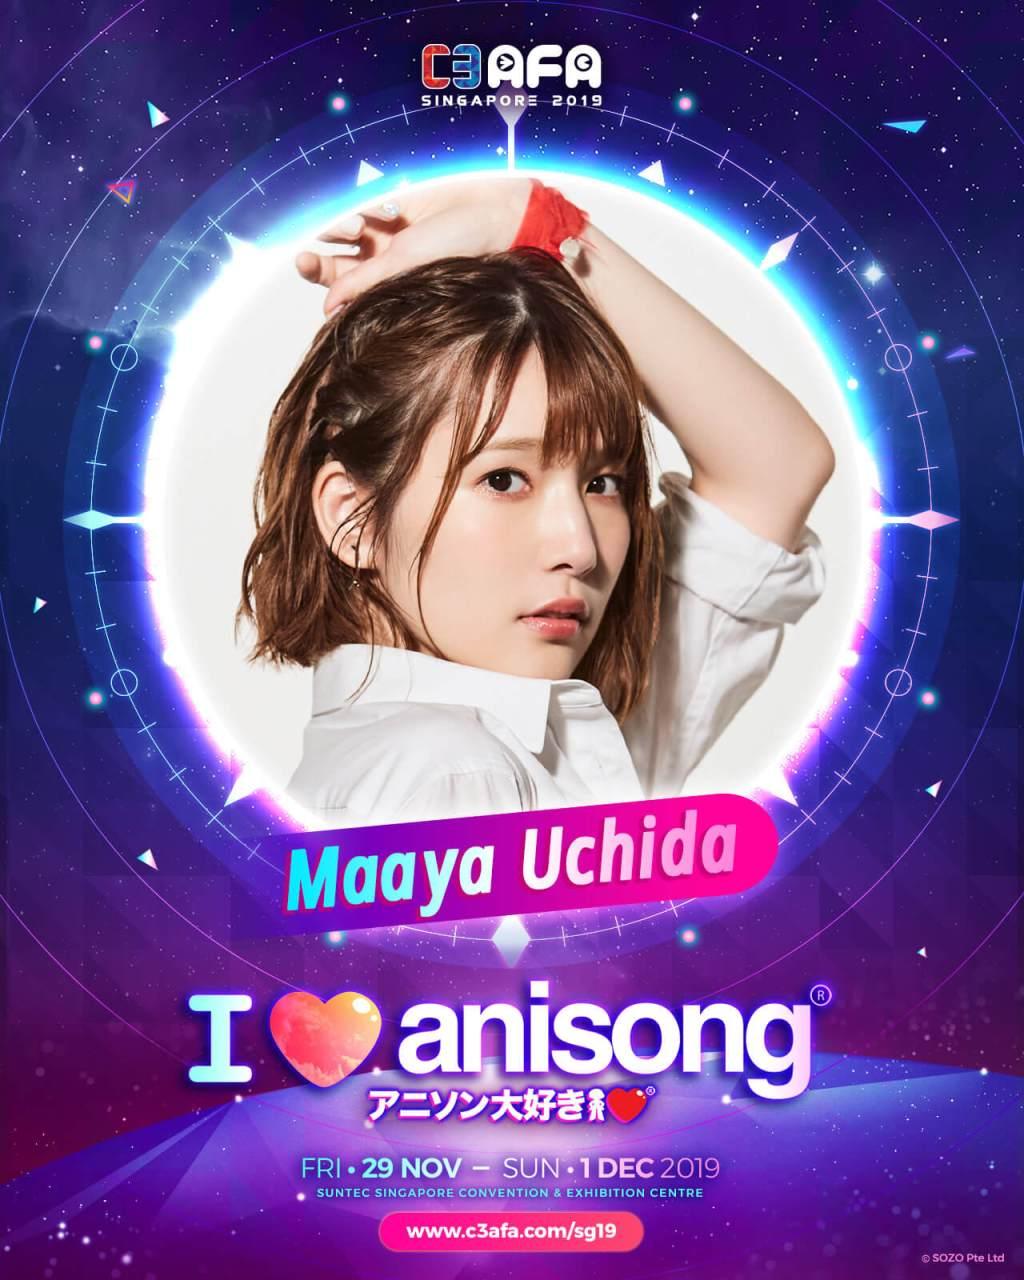 [SO JAPAN x C3AFA Singapore] An Exclusive Q&A with Maaya Uchida